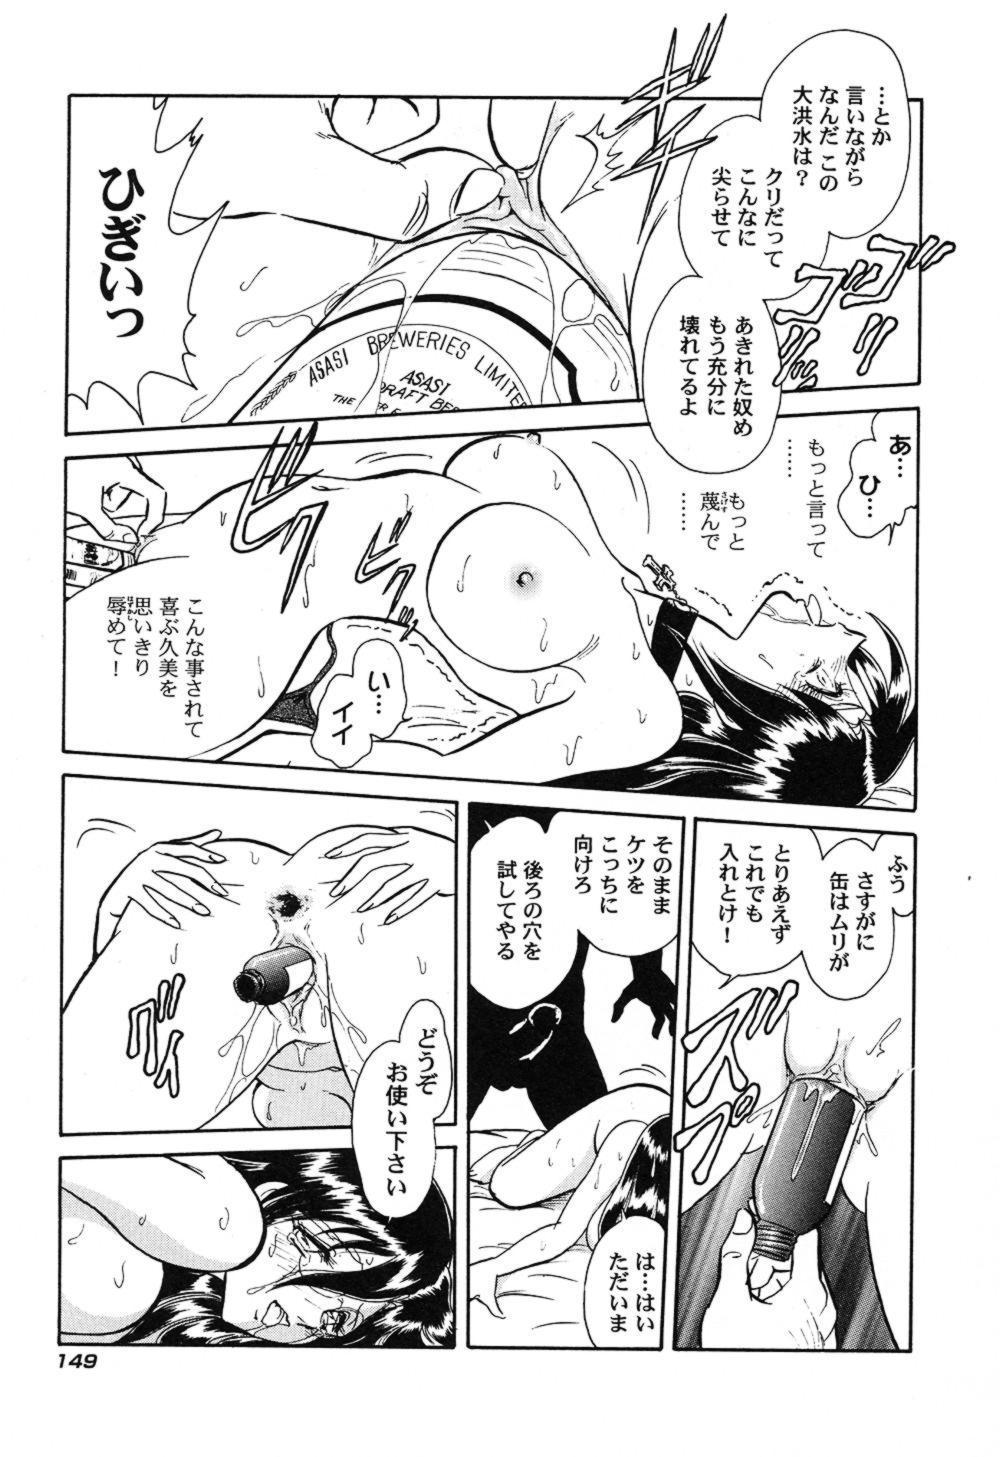 Hageshii Kagai Jugyou 151